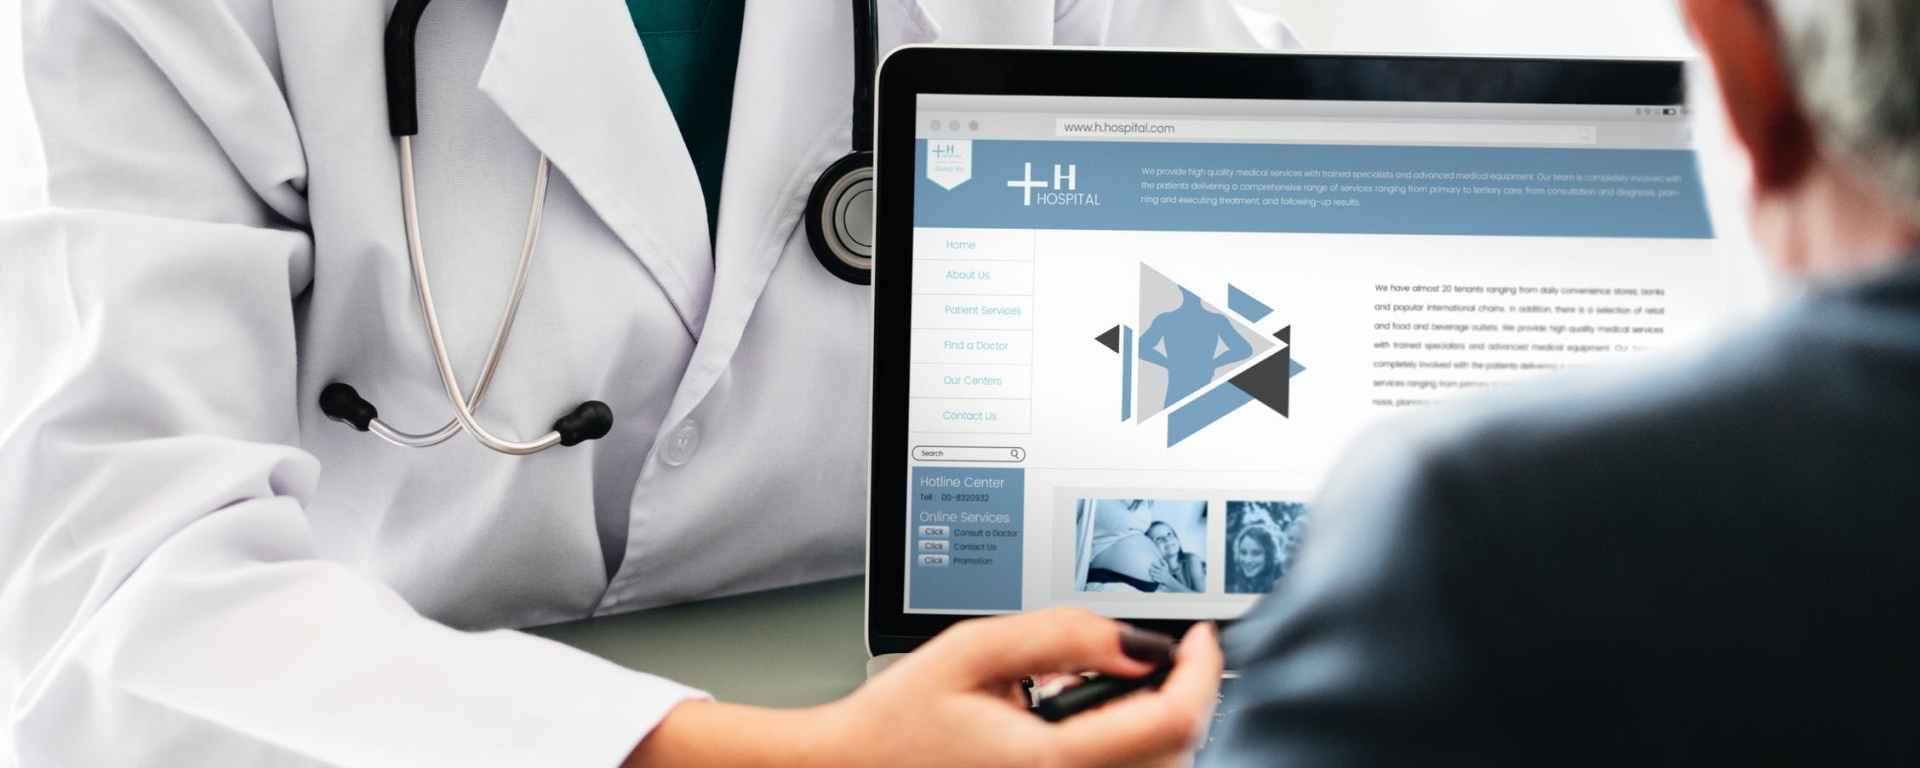 doctor explains treatment options on a laptop